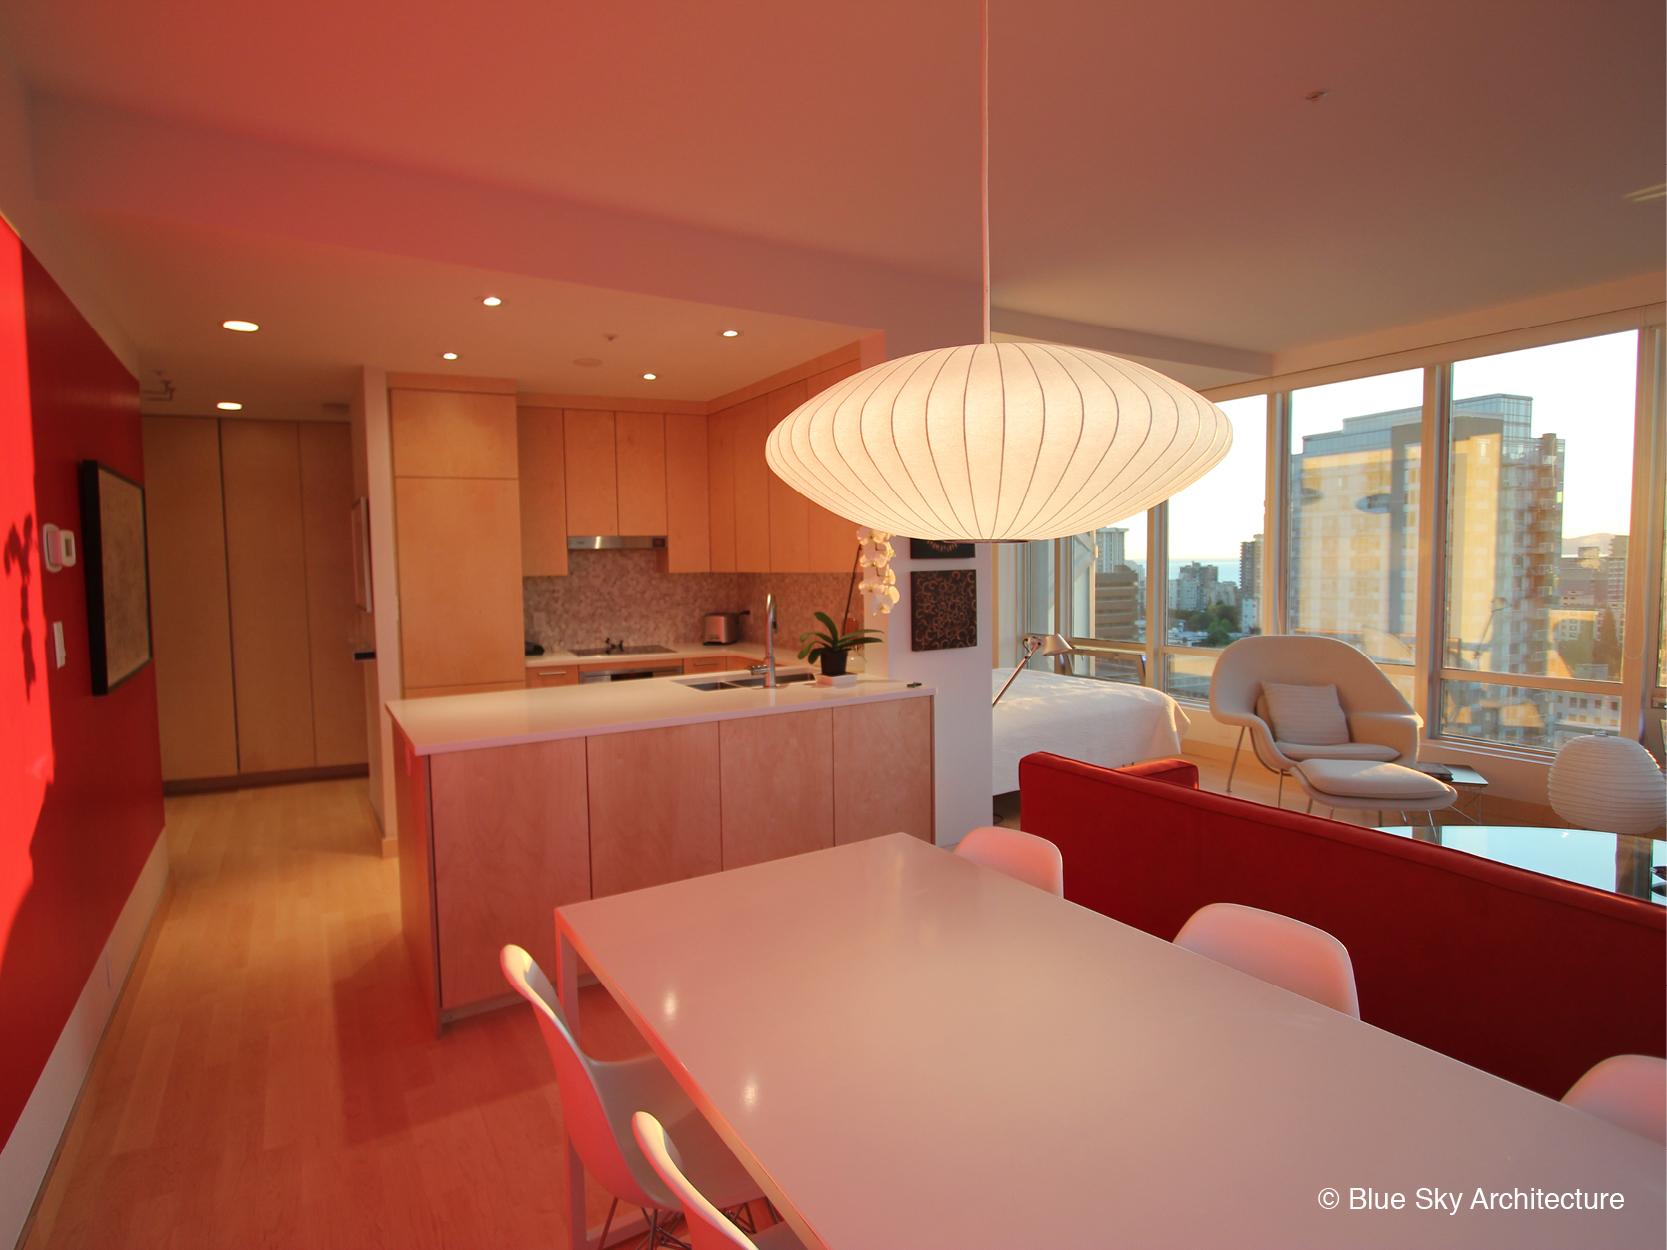 Birch plywood kitchen in Vancouver condo renovation